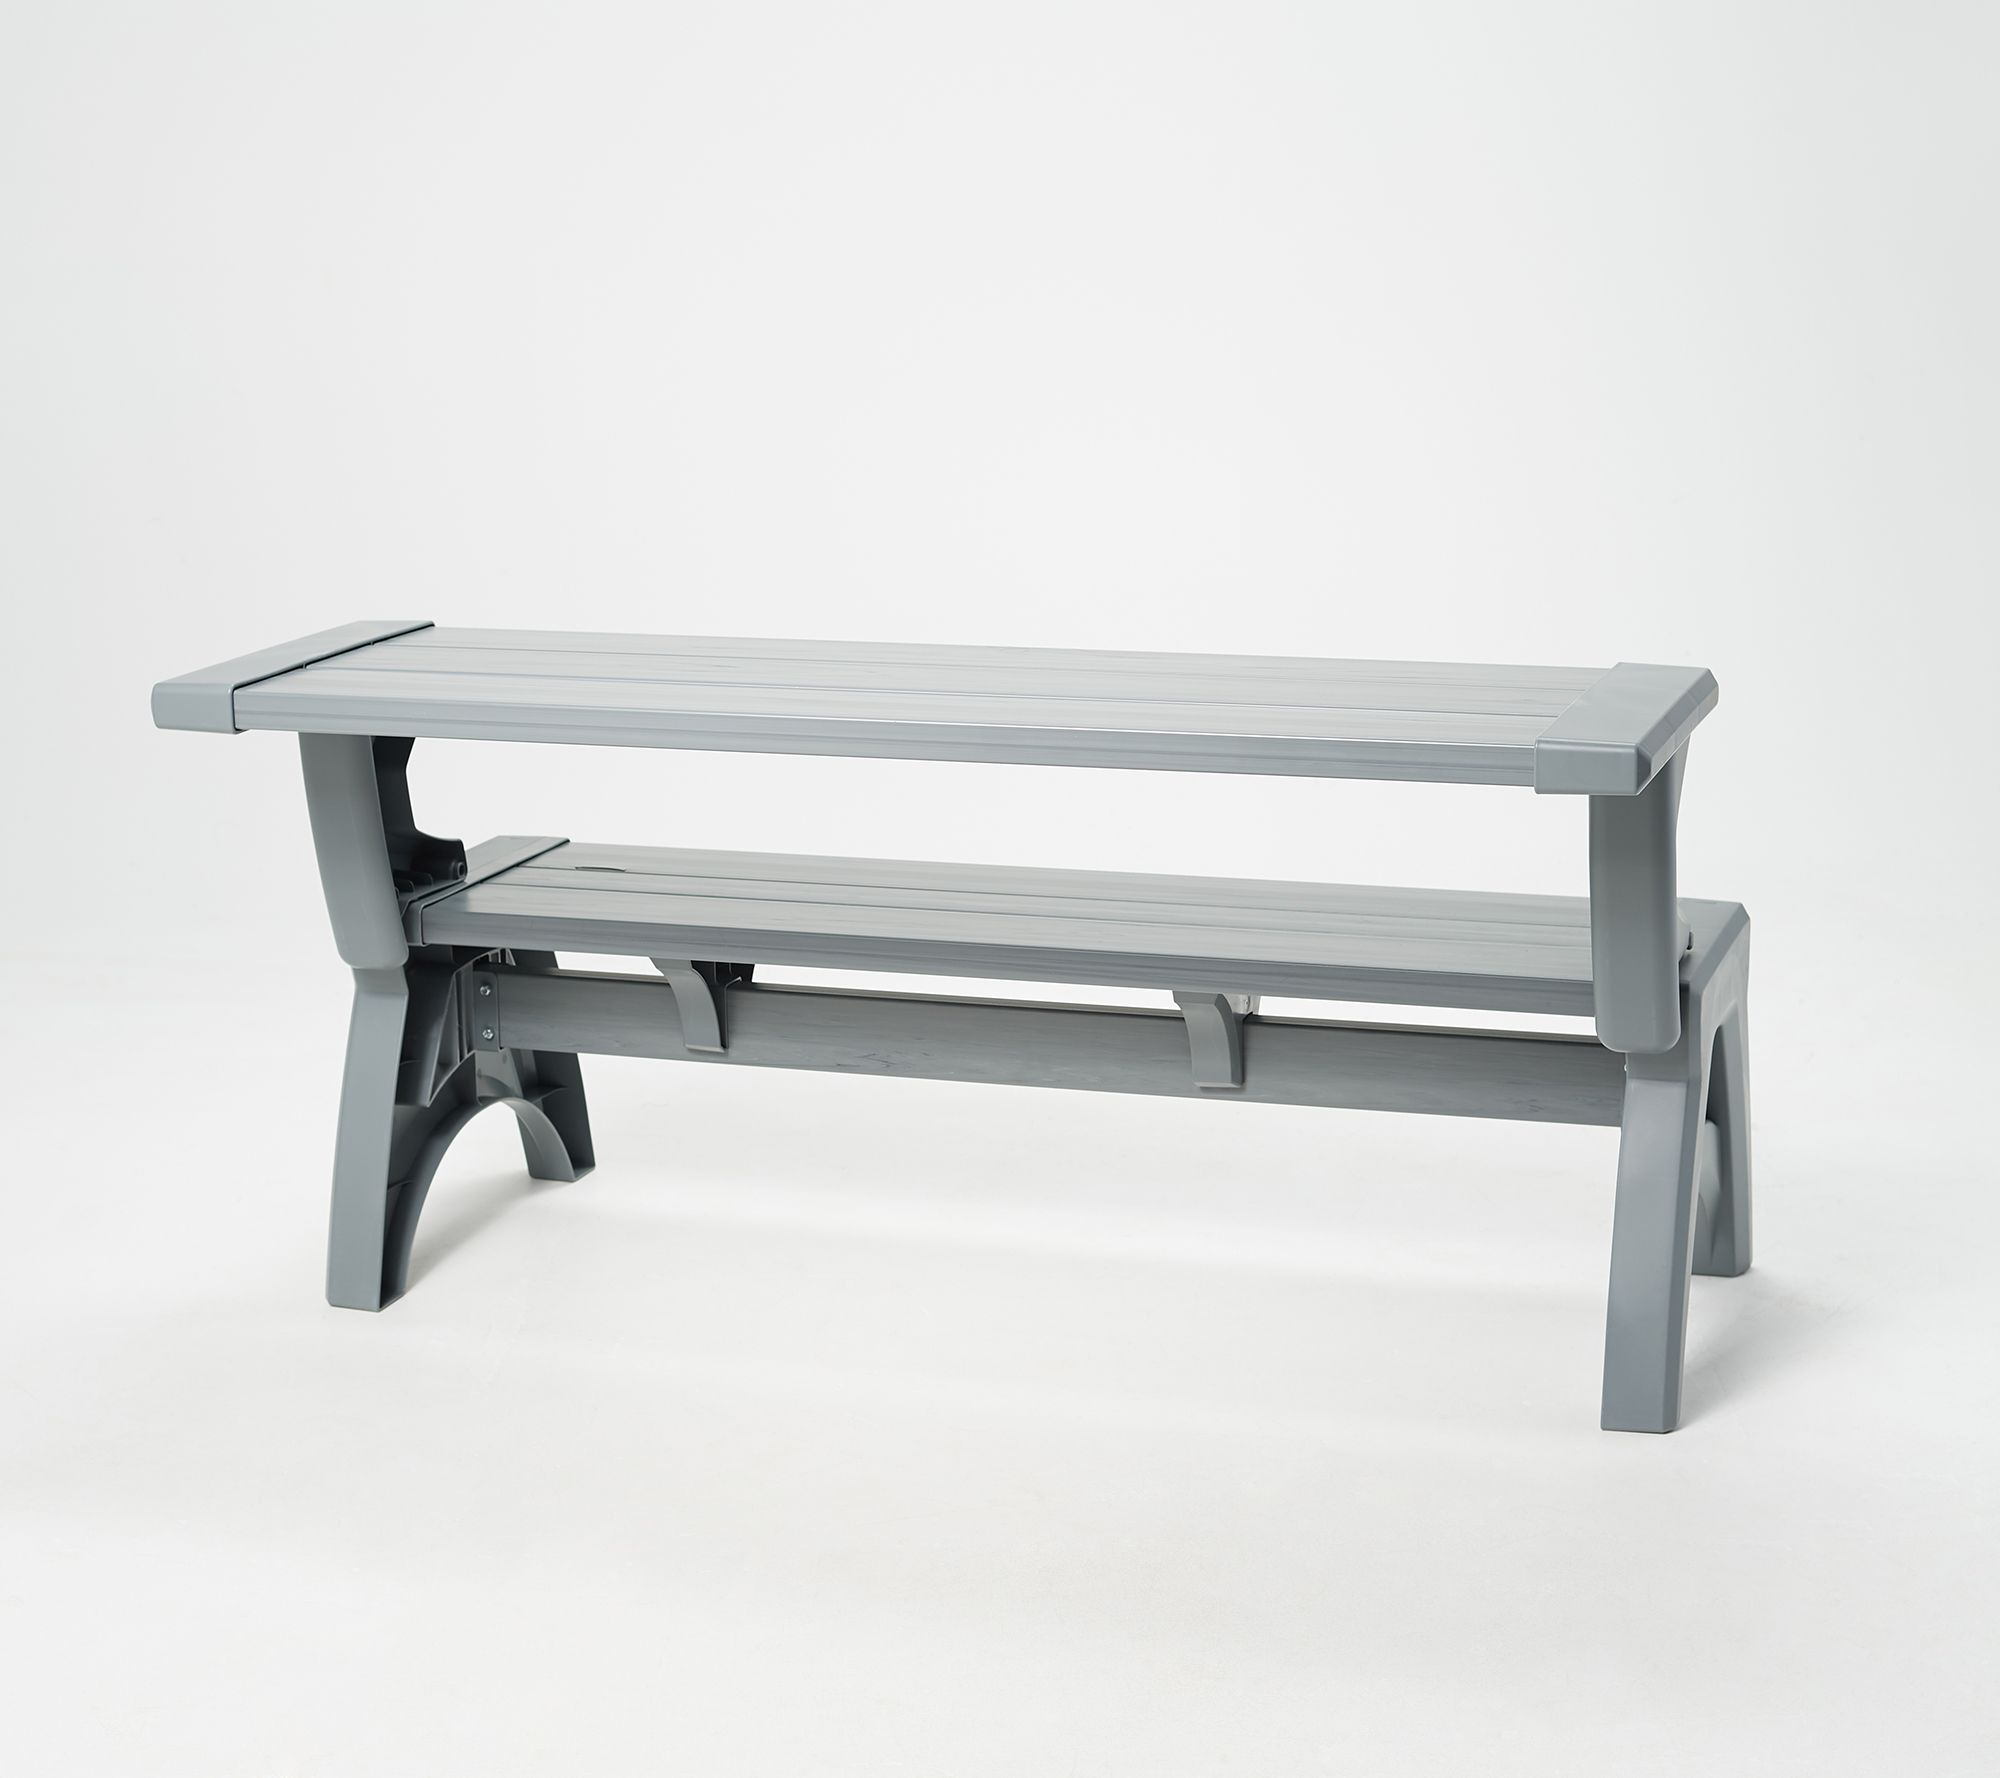 convert a bench gen ii xl designer series outdoor 2 in 1 bench to table qvc com